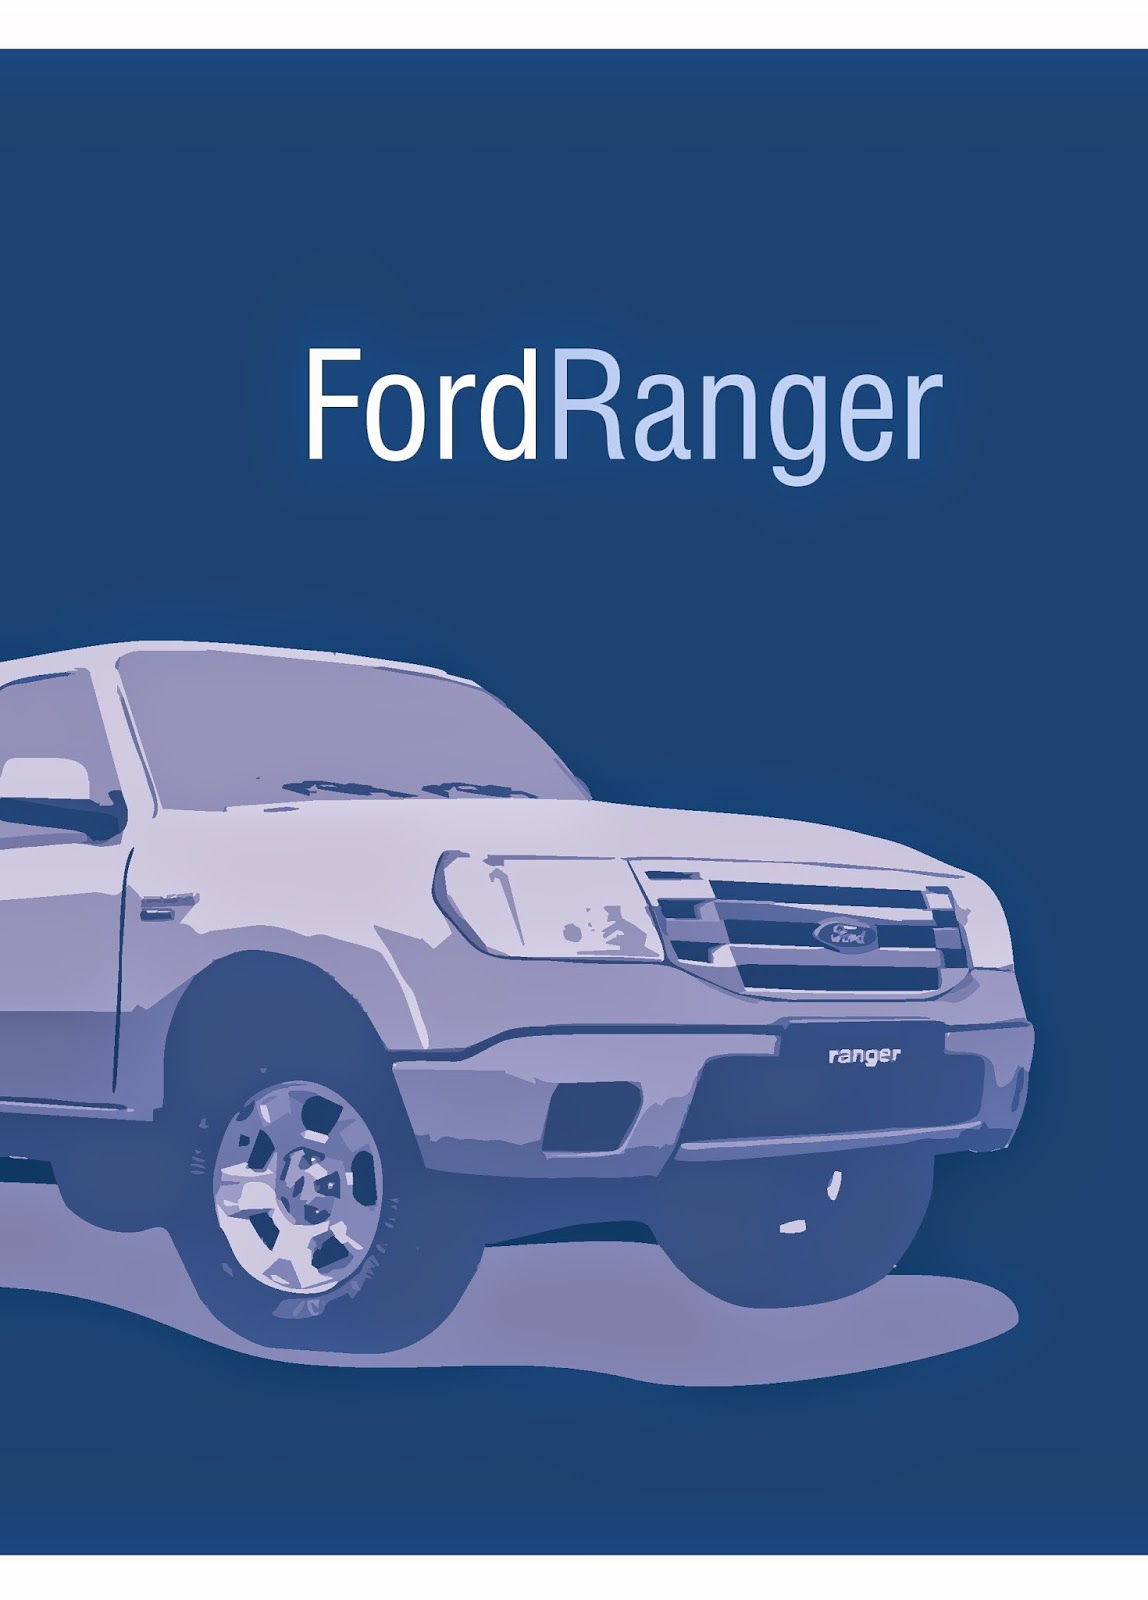 manuais do propriet rio ford ranger 2010 rh manuaisdoproprietario blogspot com 97 Ford Ranger with Manual Lift 97 Ford Ranger Repair Manual